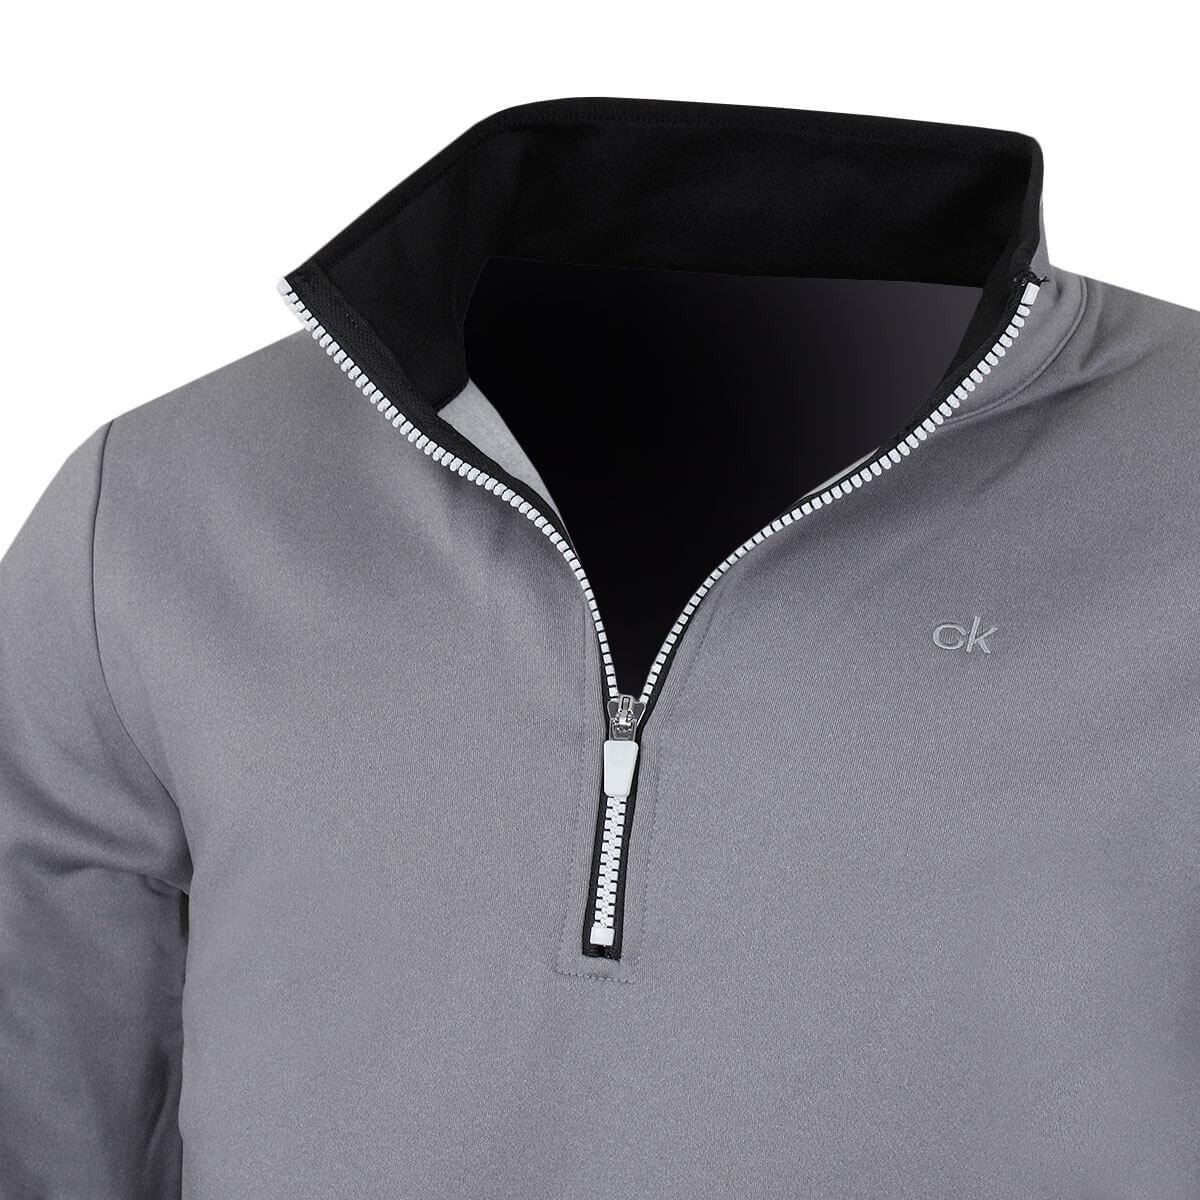 Calvin-Klein-Golf-Para-Hombre-Sueter-Ligero-rendimiento-con-cremallera-de-2019-1-2-50-De-Descuento miniatura 13